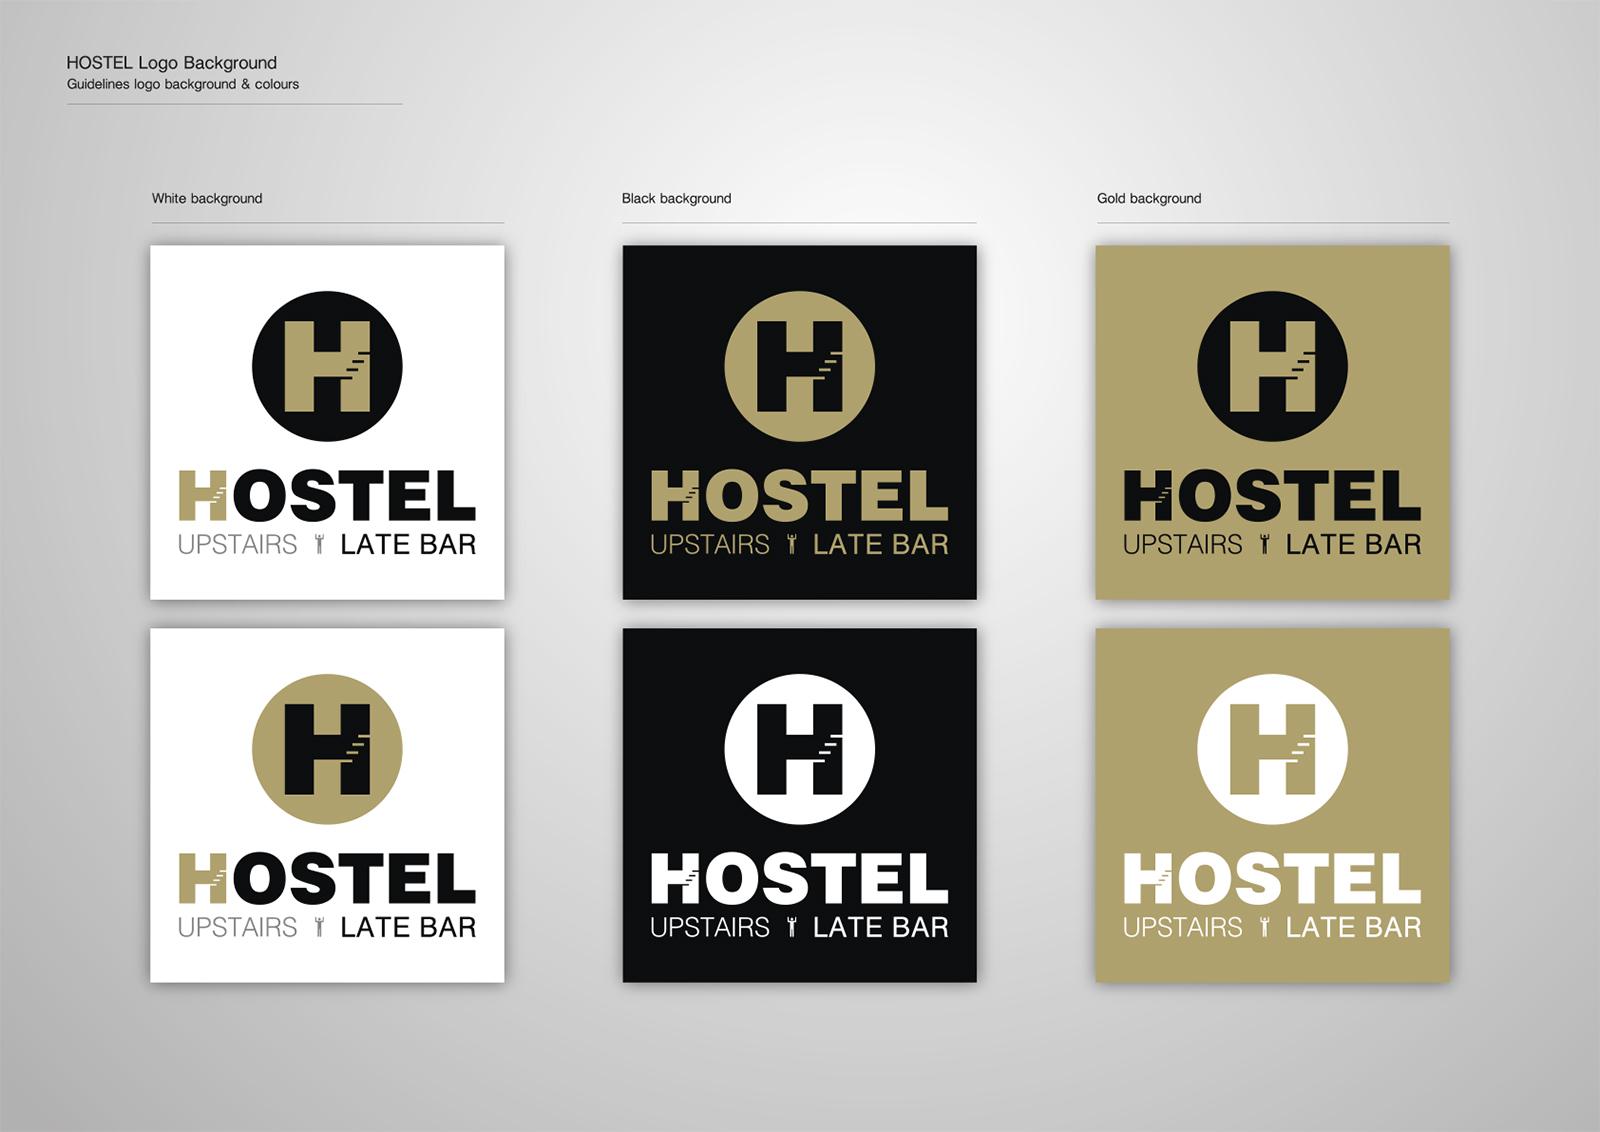 Corporate Identity Hostel_Upstairs_Late Bar_Logo Backgrounds_Yianart